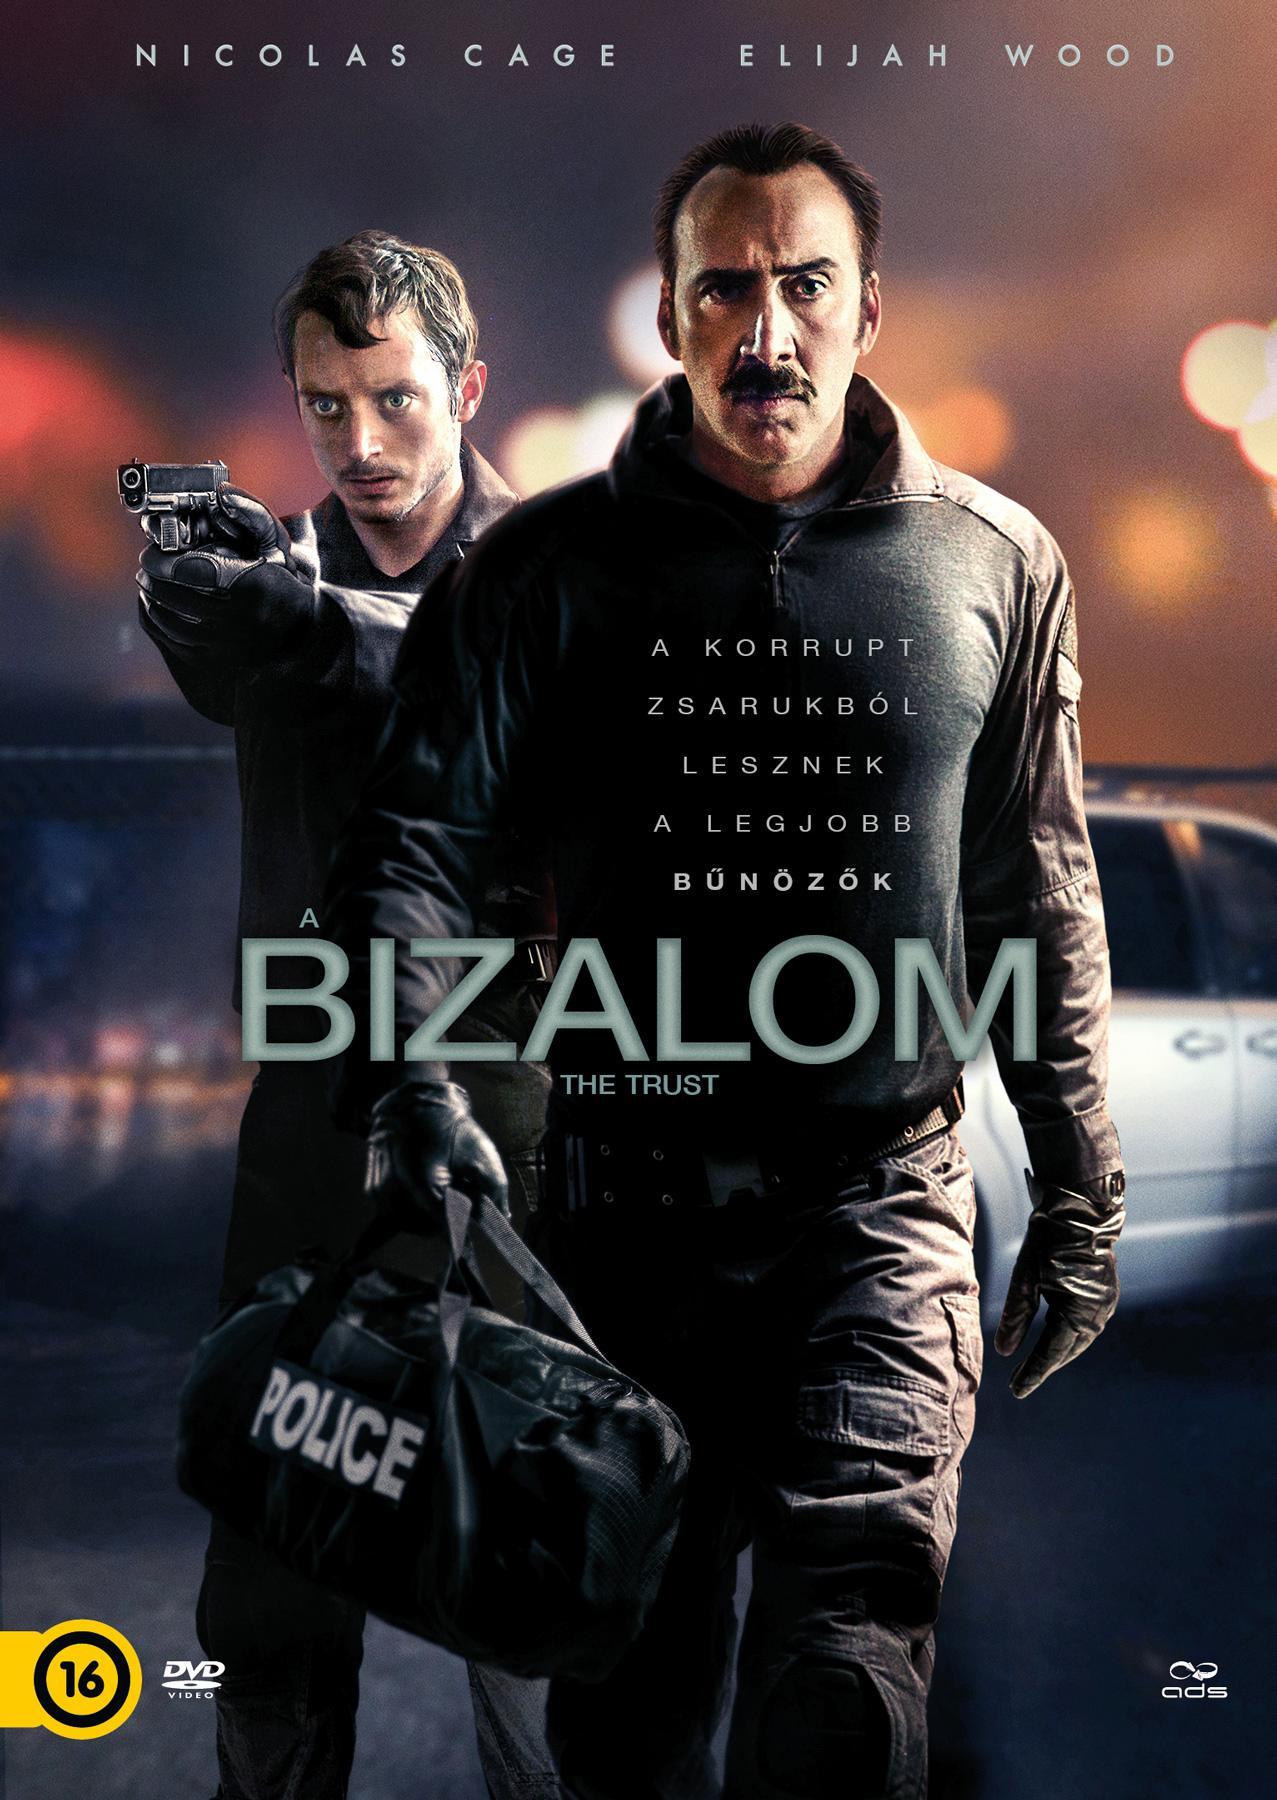 ALEX BREWER, BENJAMIN BREWER - A BIZALOM - DVD -